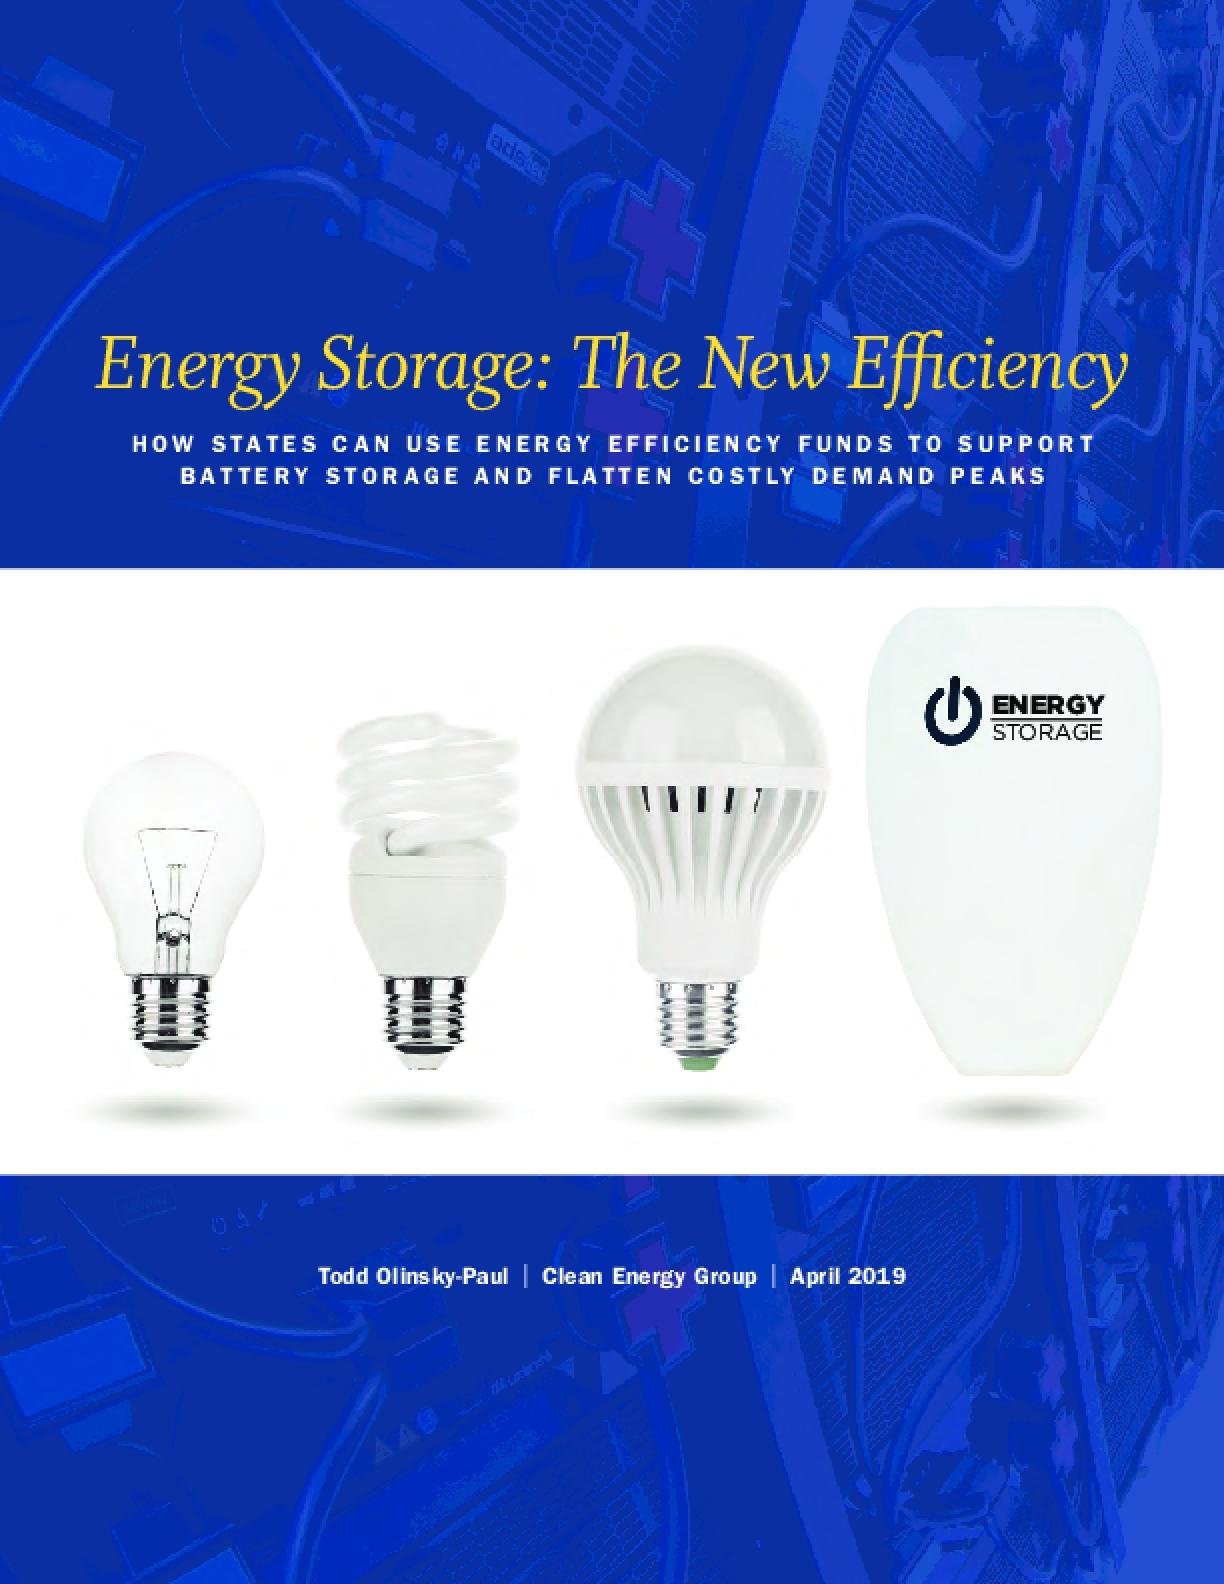 Energy Storage: The New Efficiency